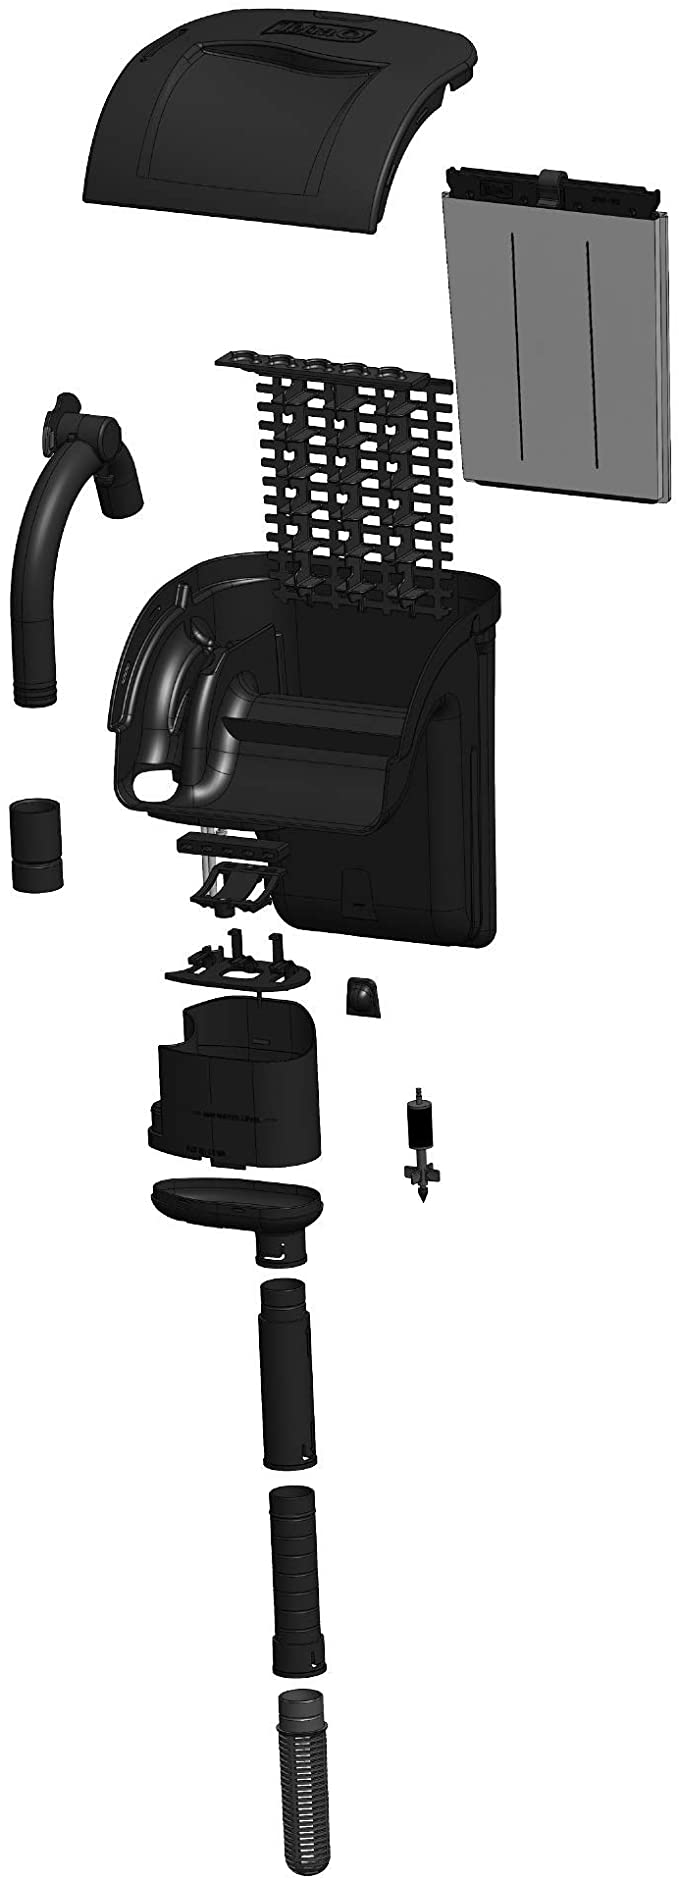 Tetra 78003 product image 5